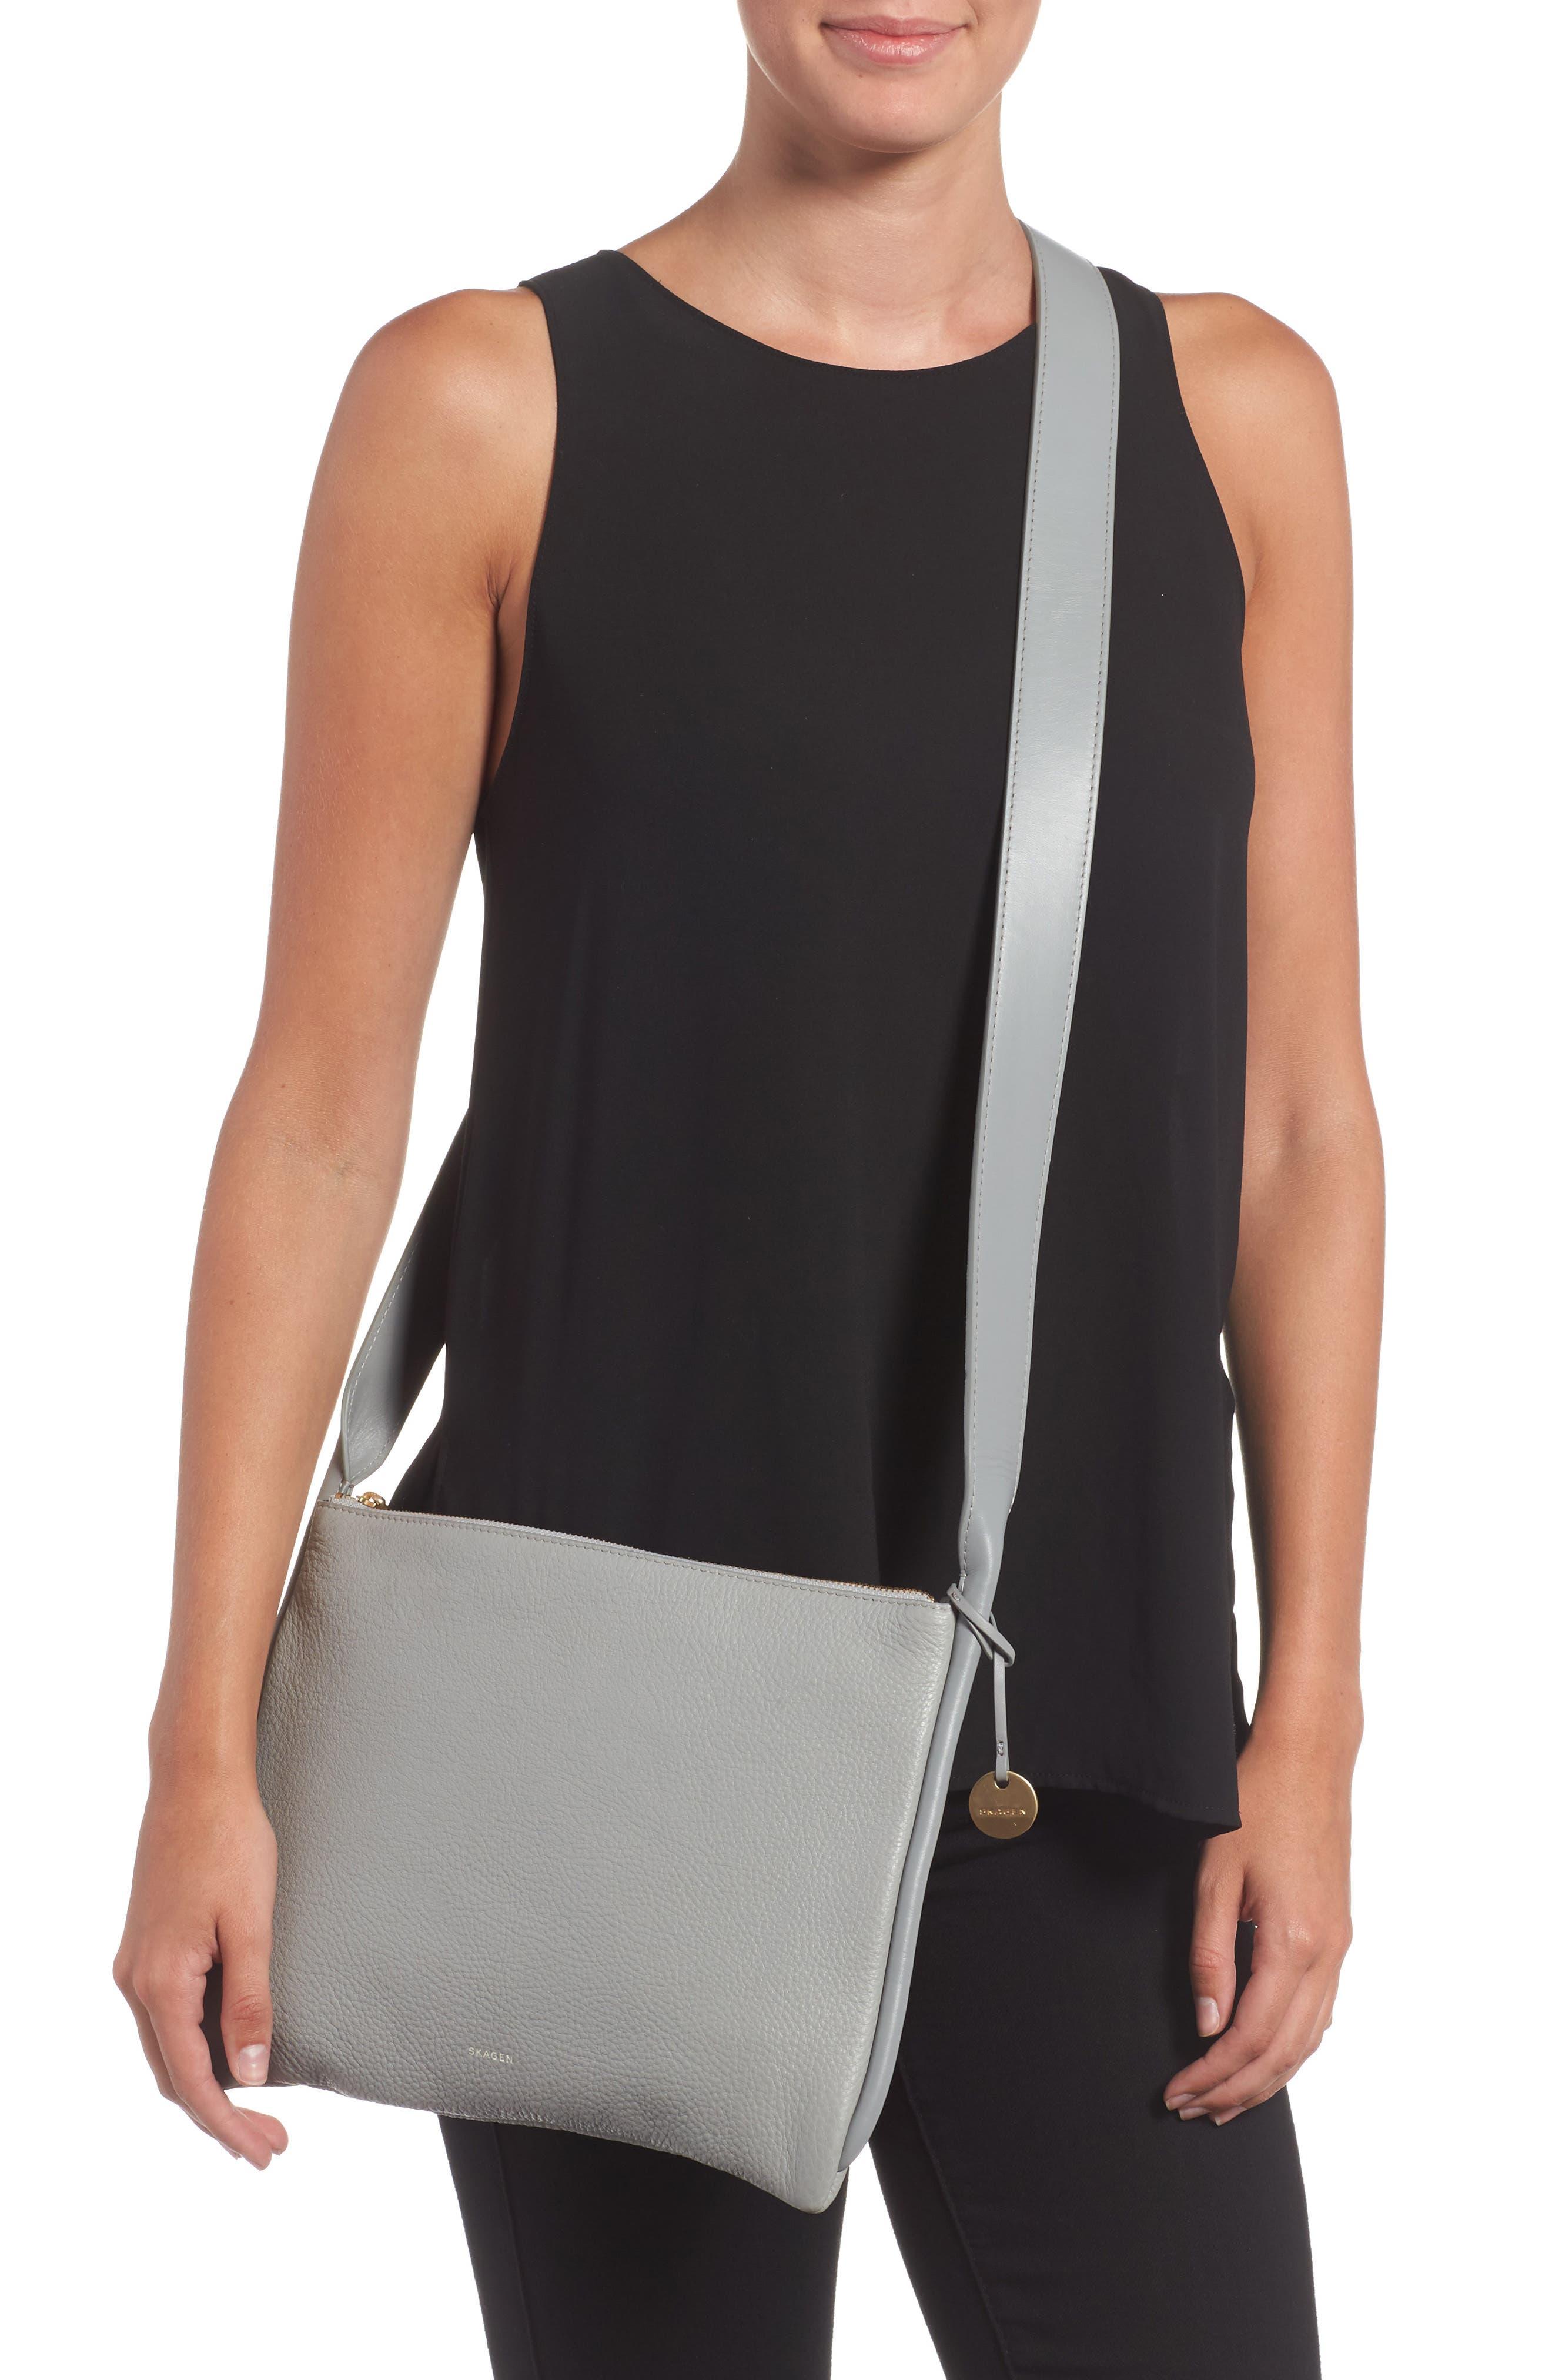 Slim Anesa Leather Crossbody Bag,                             Alternate thumbnail 2, color,                             021